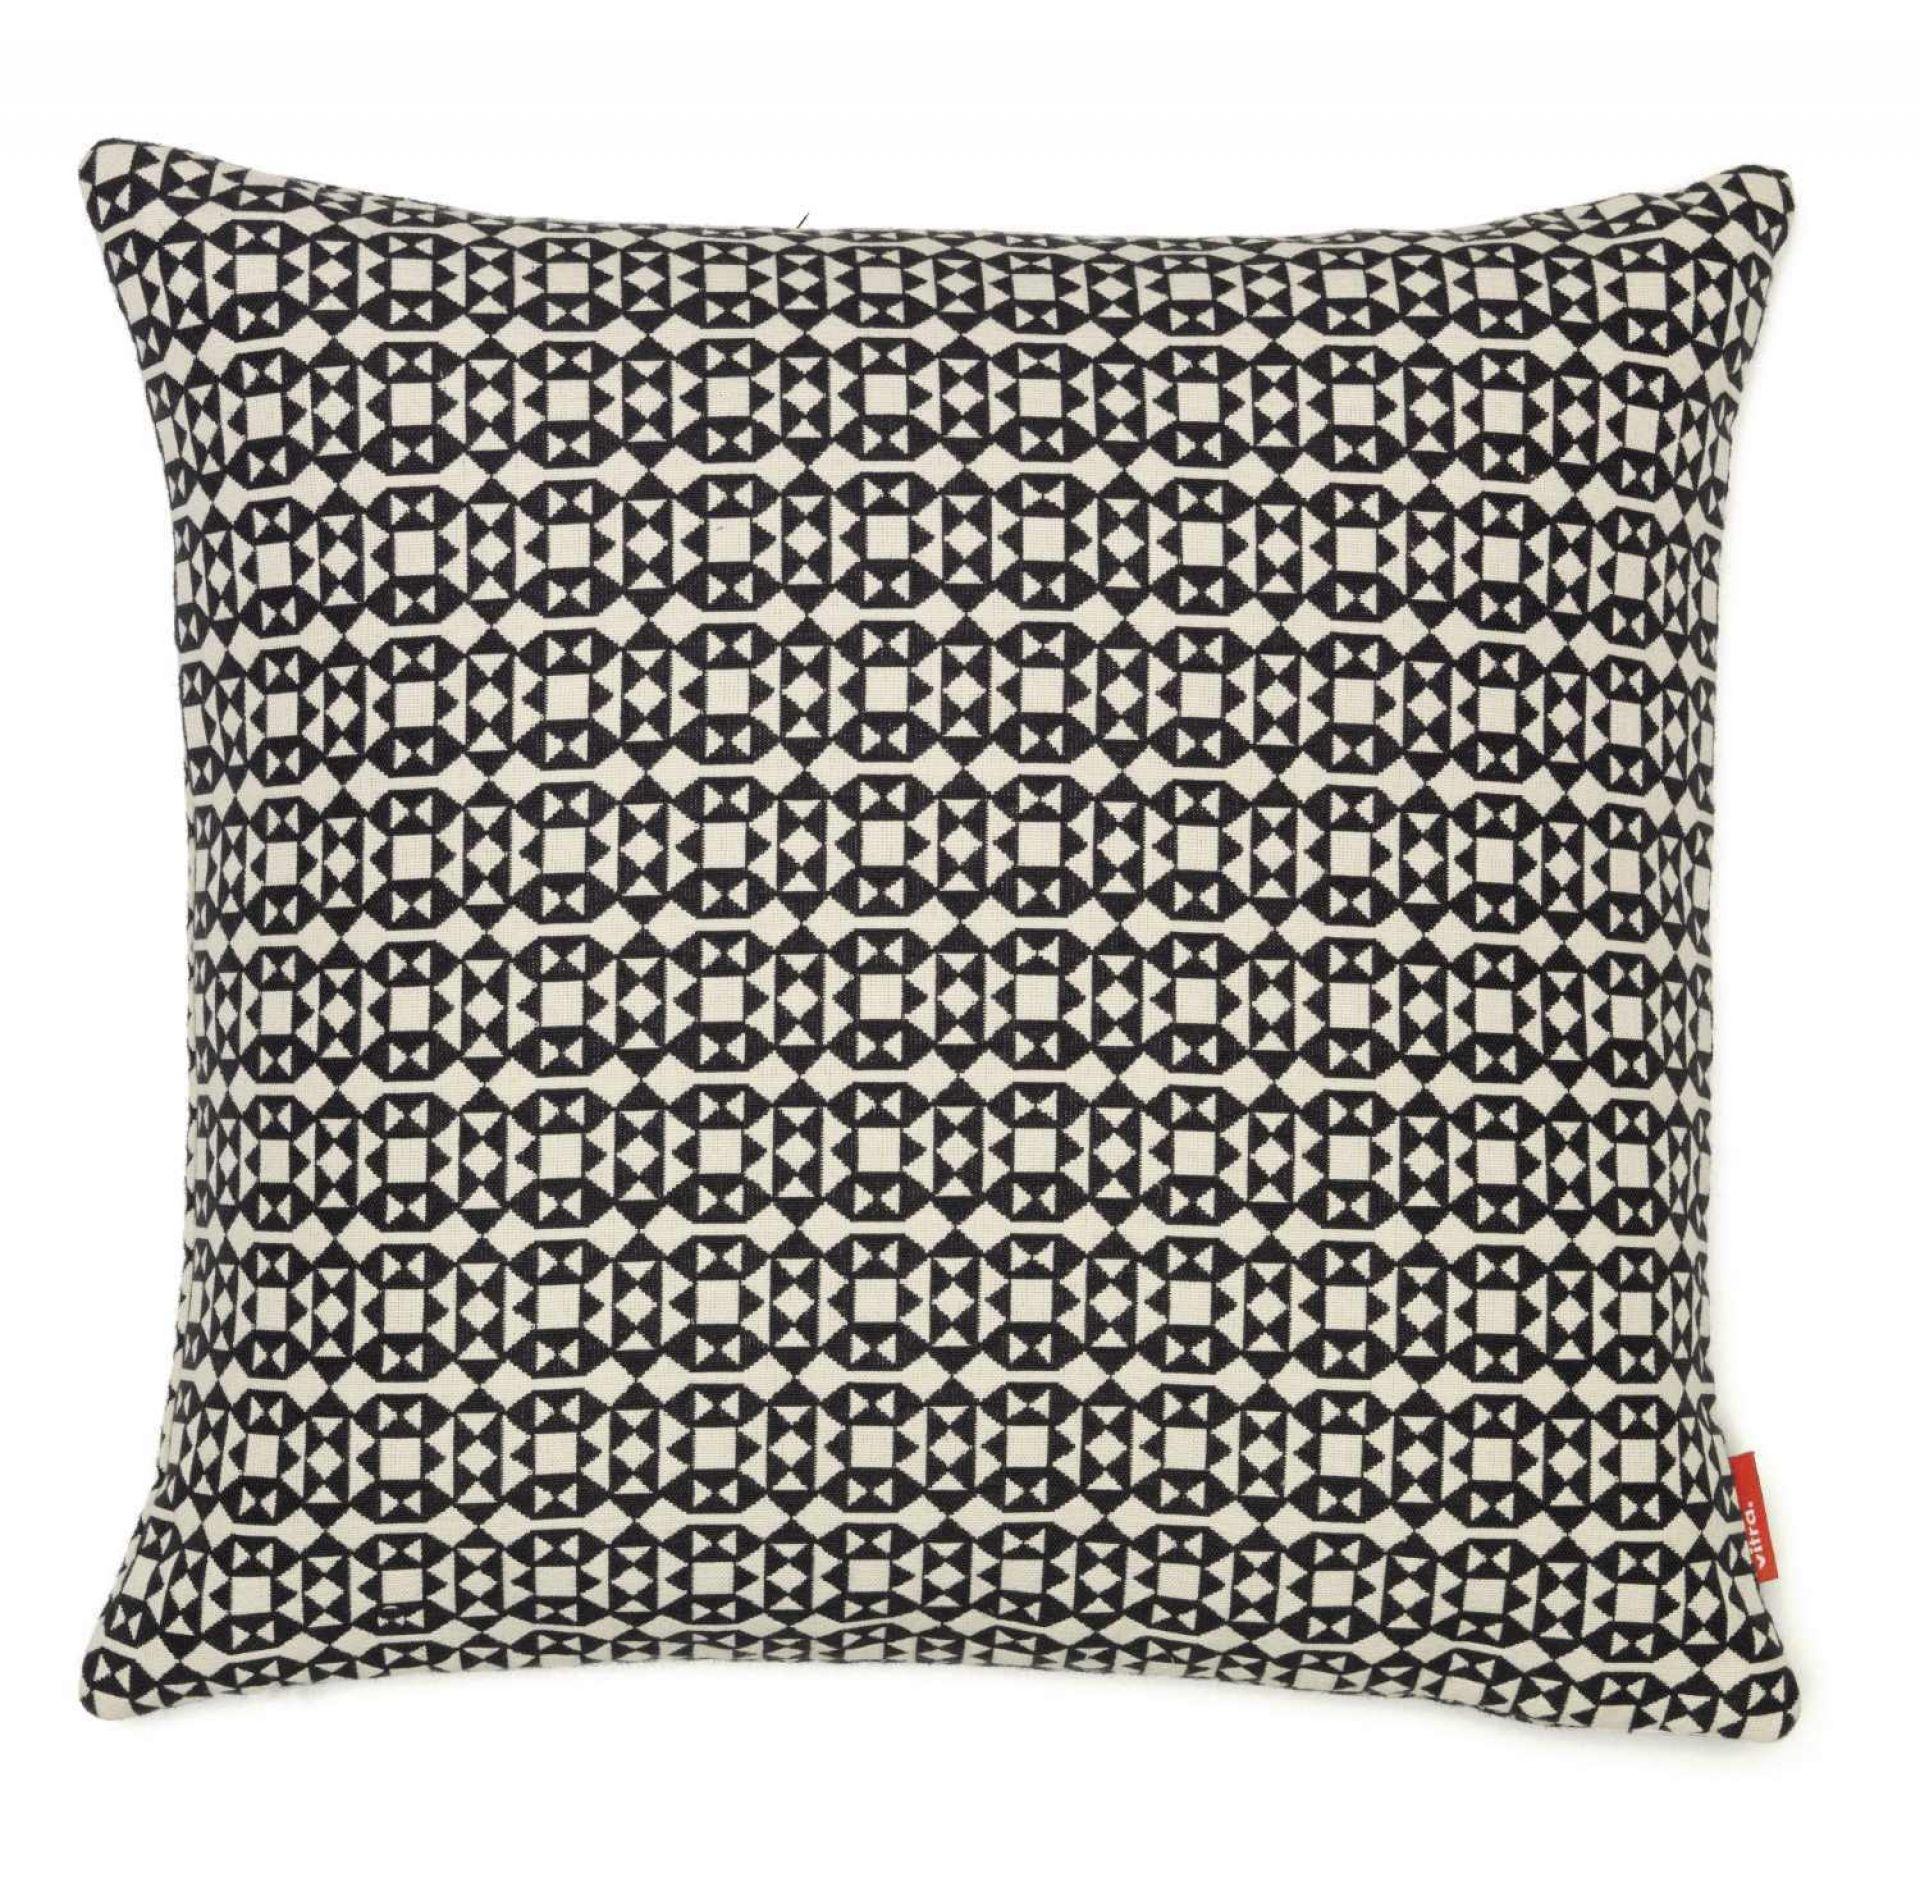 Classic Maharam Pillows Facets Kissen Vitra